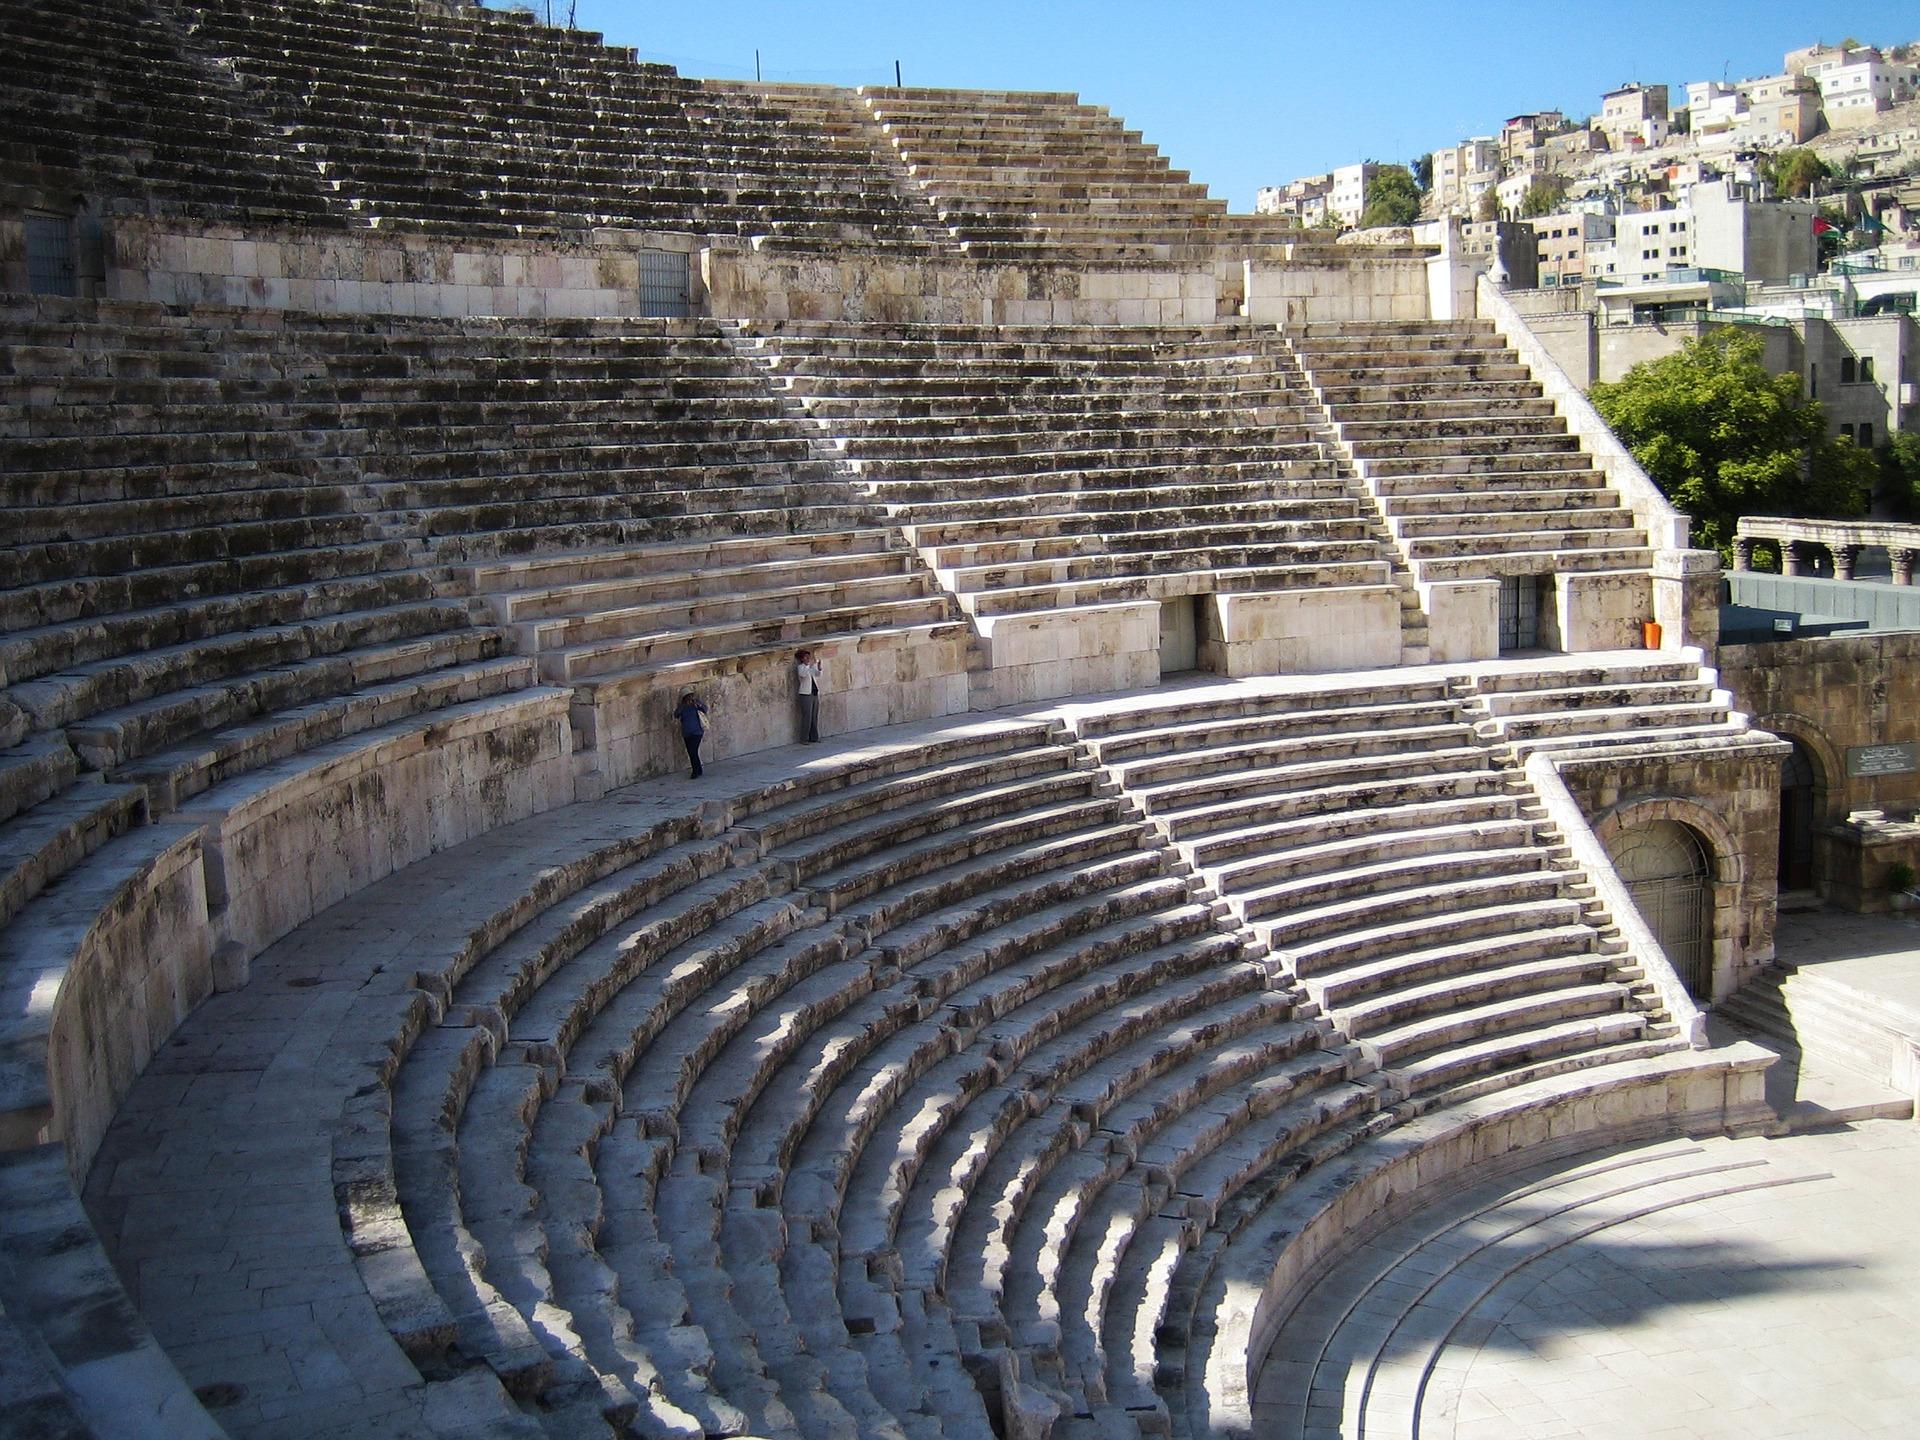 https://cestovnakancelariadaka.sk/files/product/amphitheater-1976054_1920.jpg